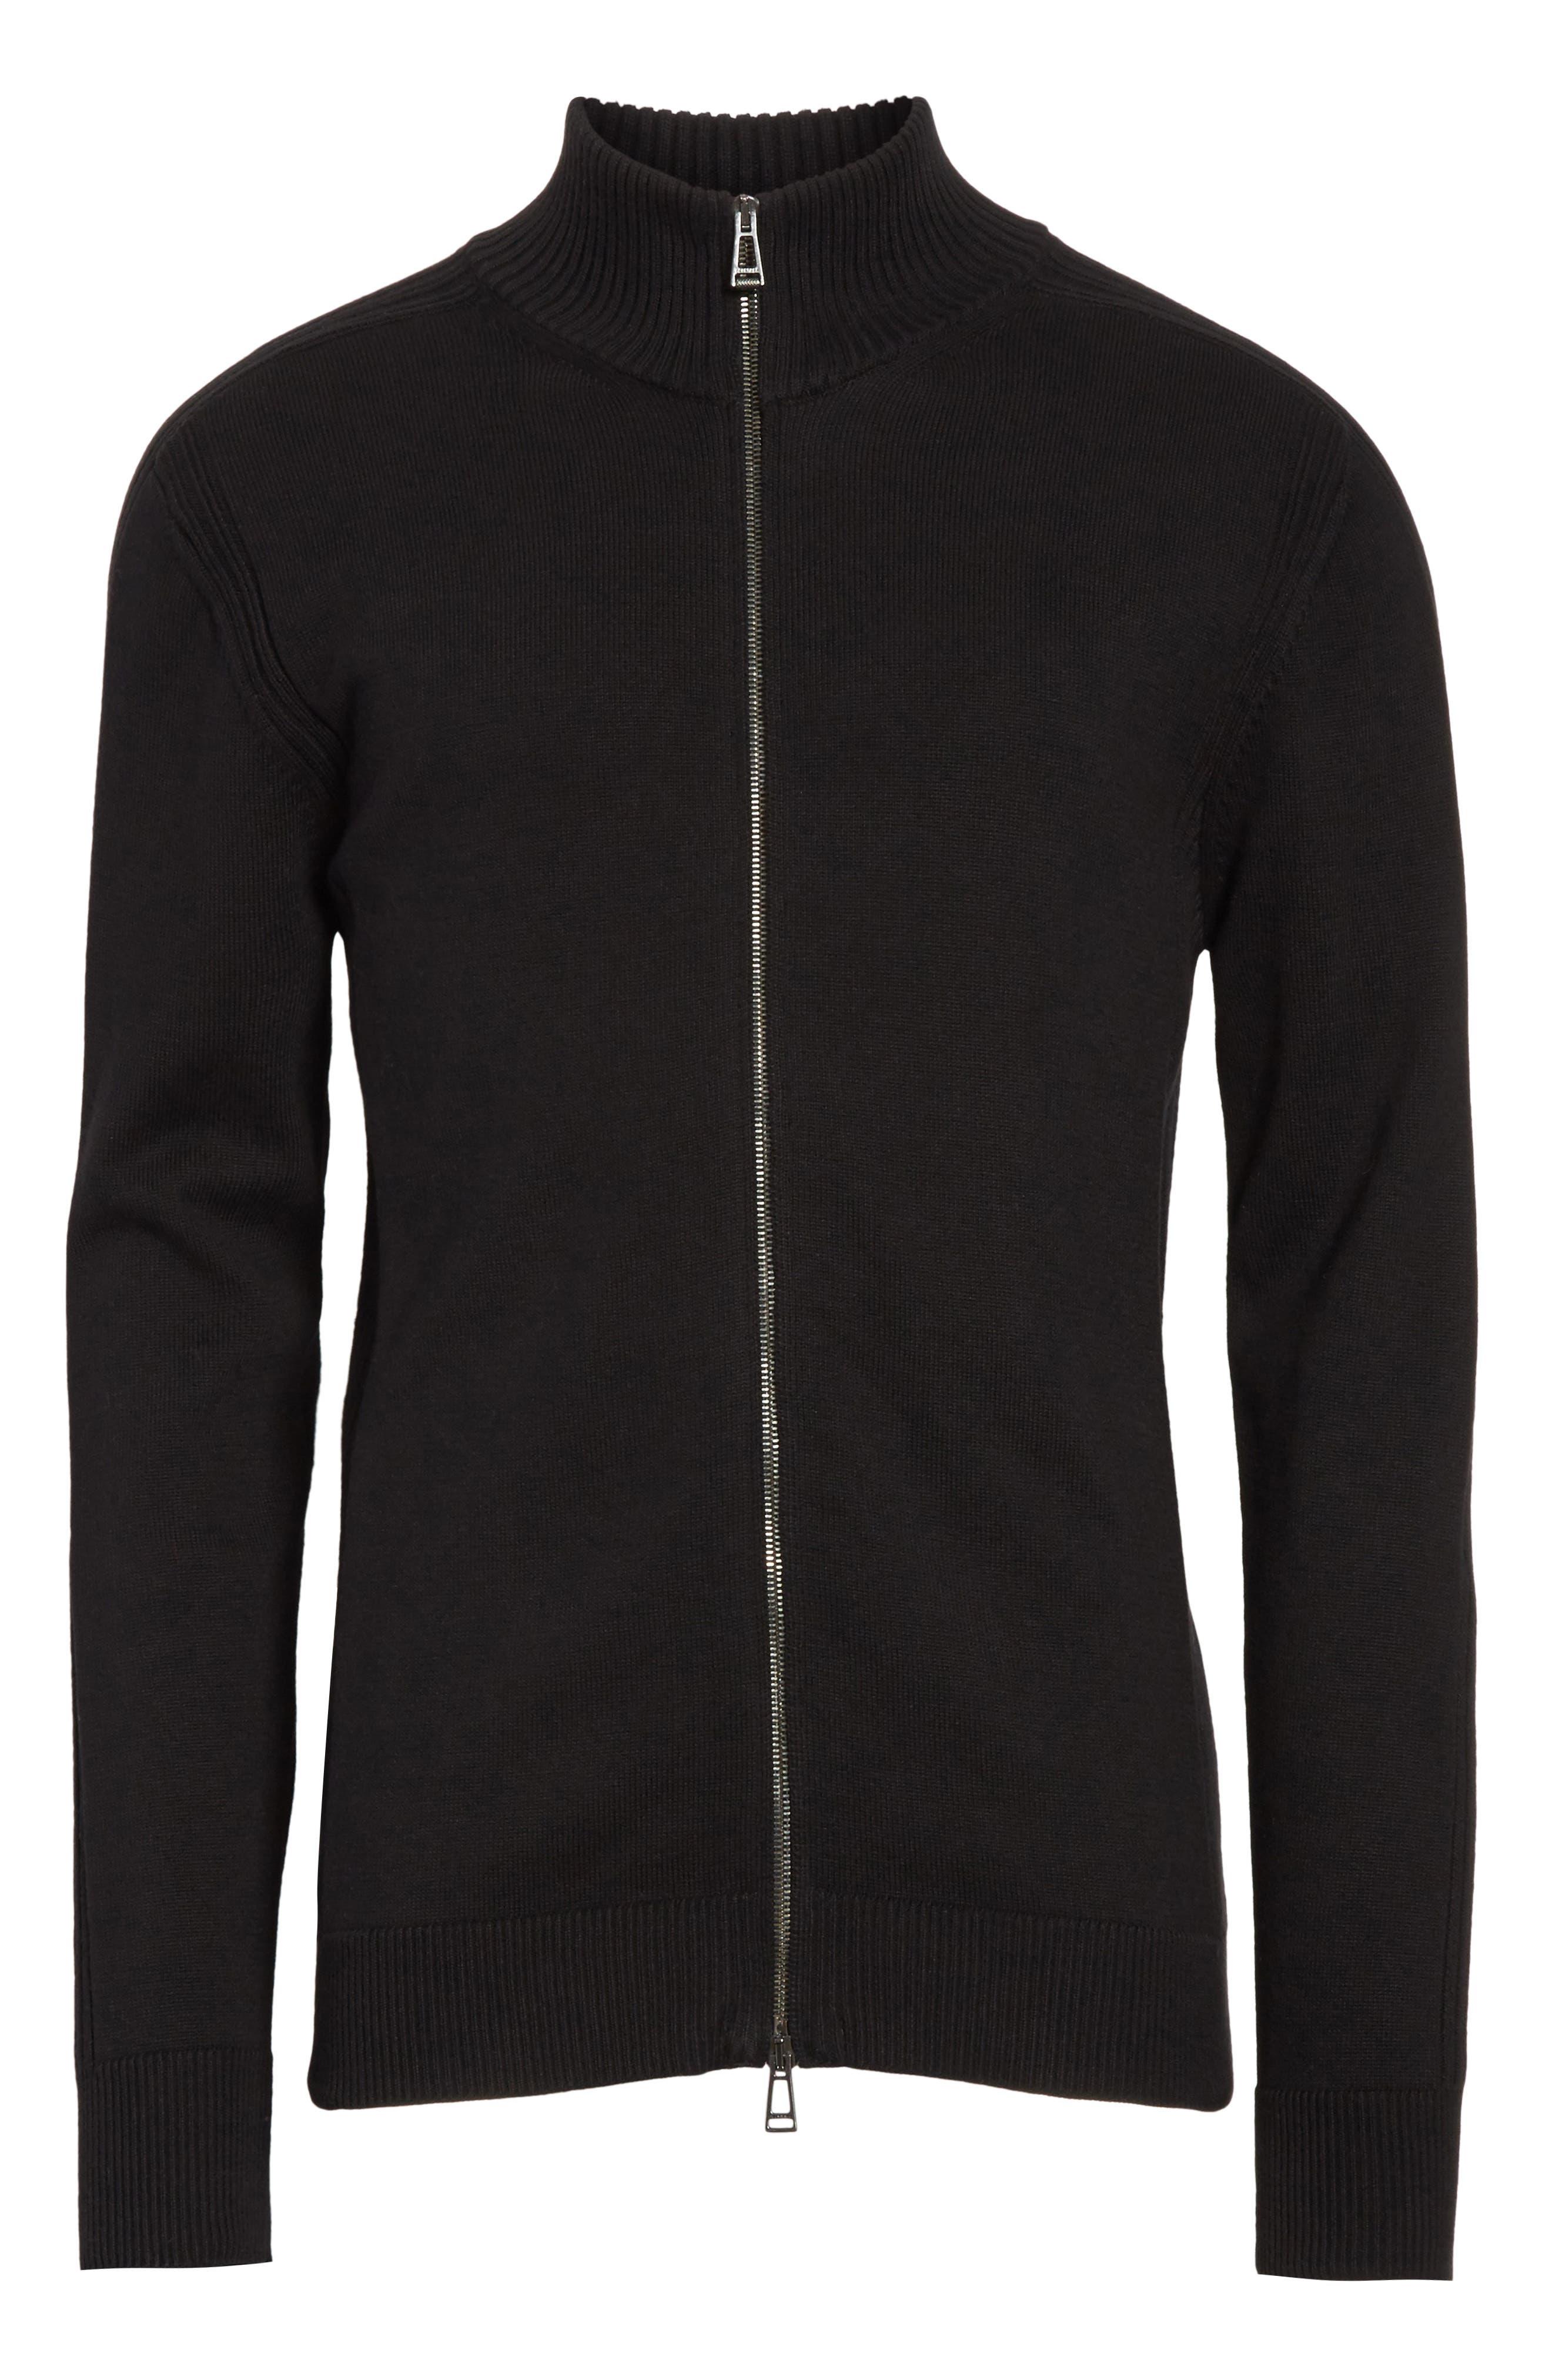 Allerford Knit Cotton Jacket,                             Alternate thumbnail 6, color,                             Black